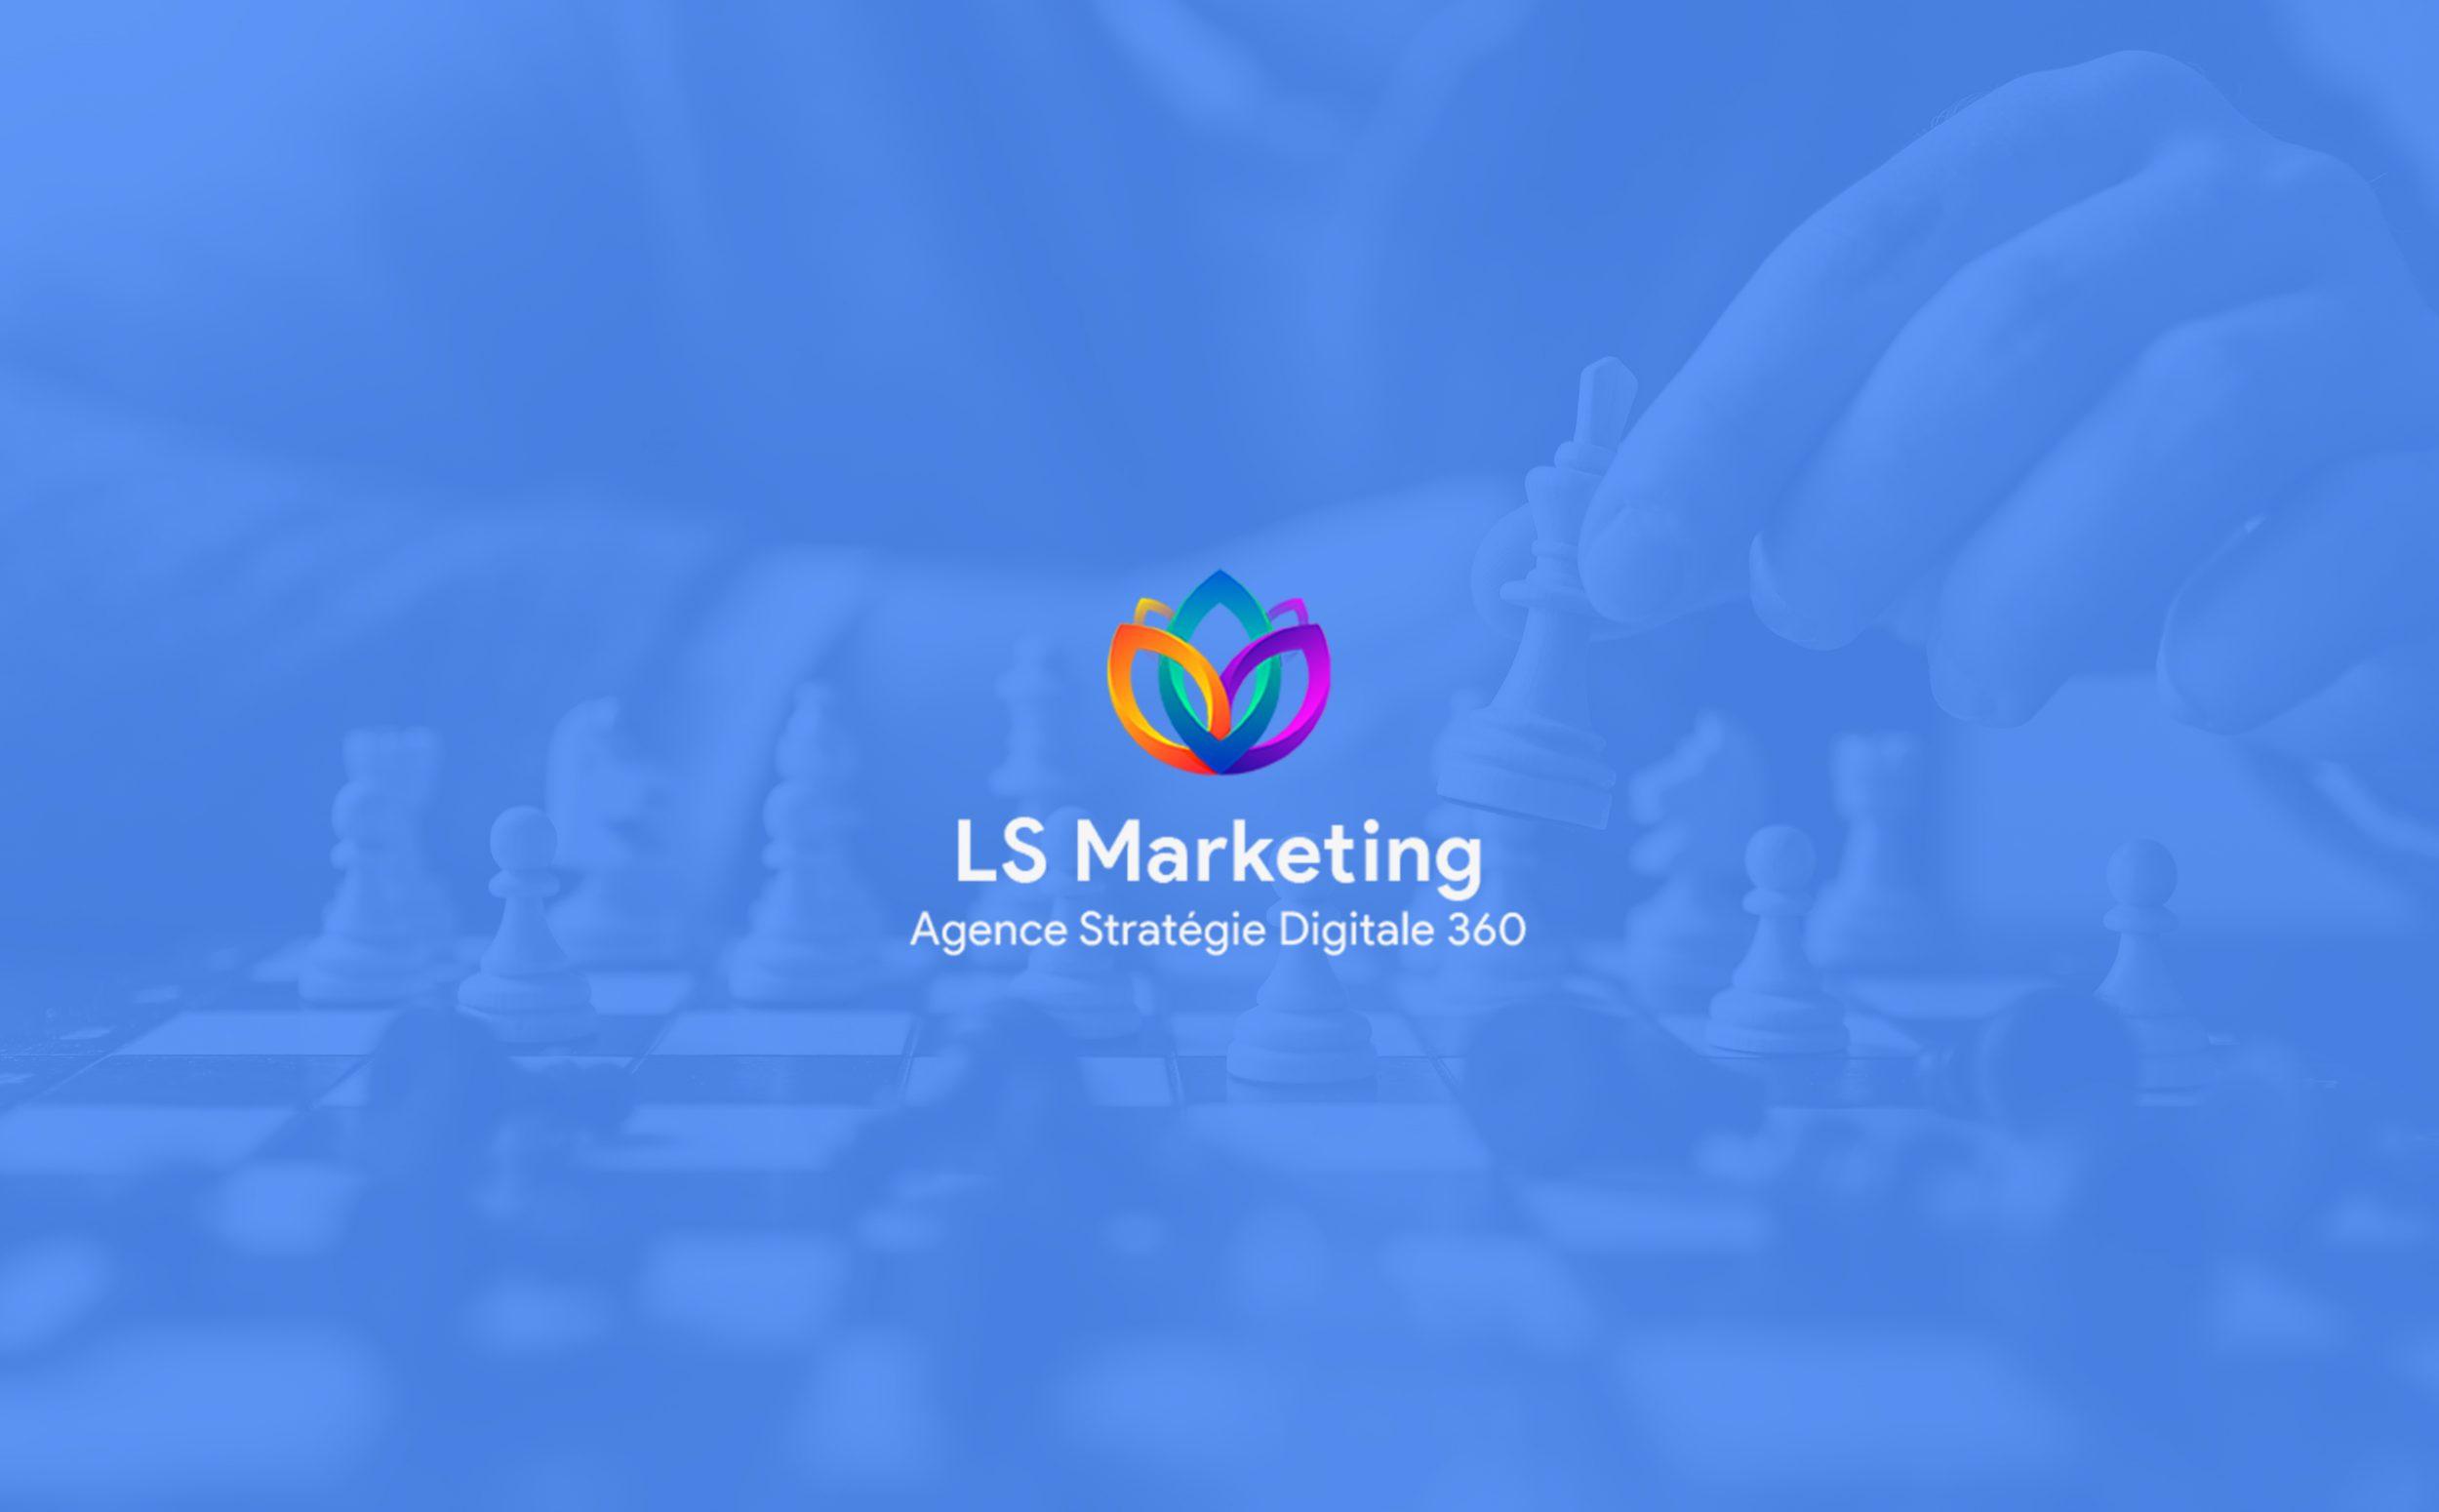 LS Marketing Démo Web Story